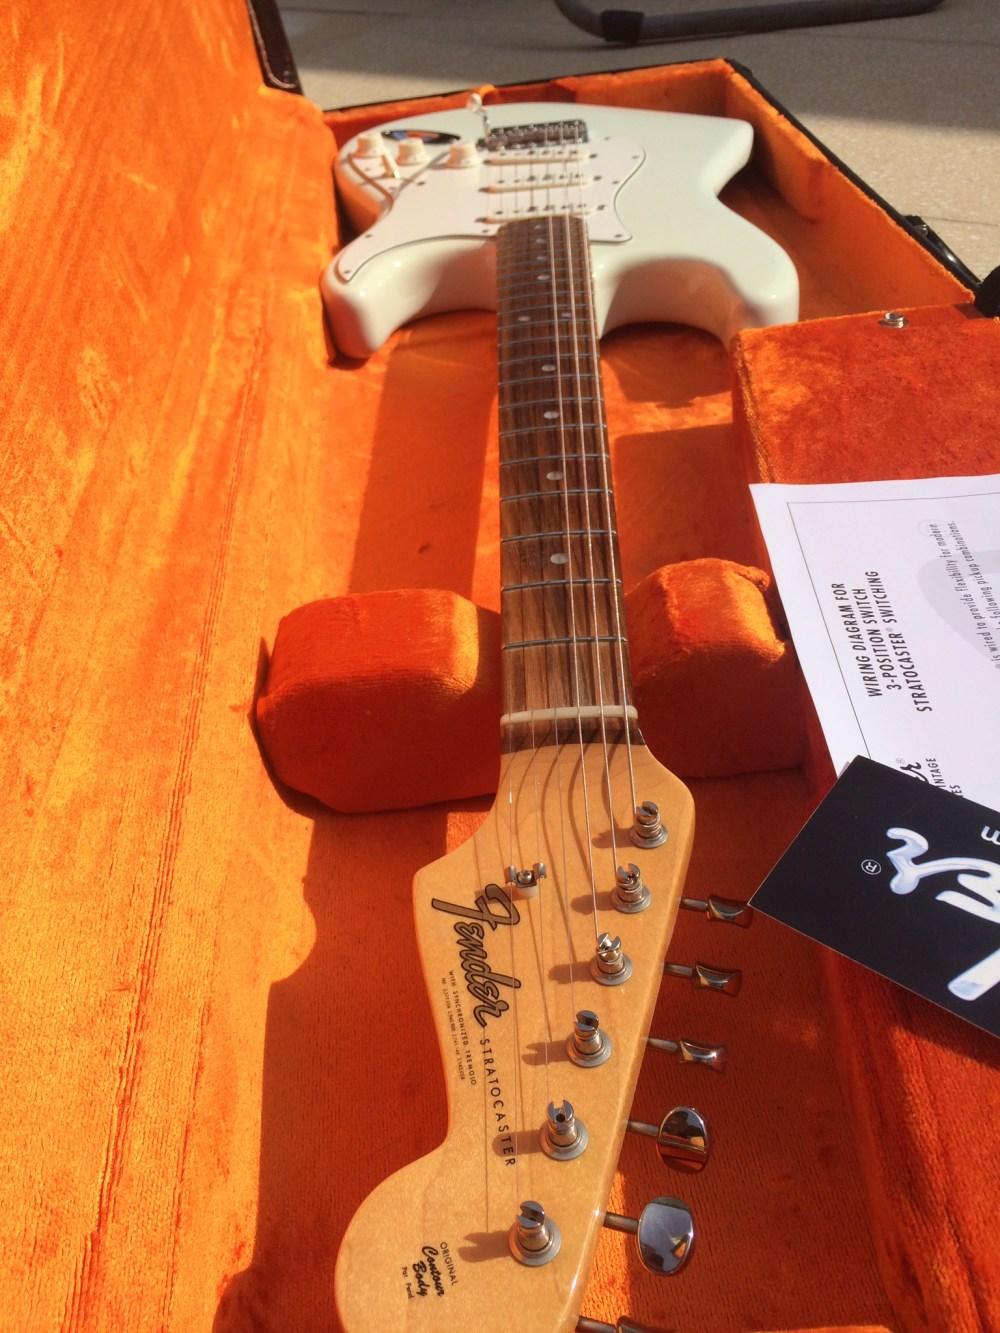 medium resolution of taylor guitar wiring neil young guitar wiring jimi hendrix guitar wiring razorback guitar